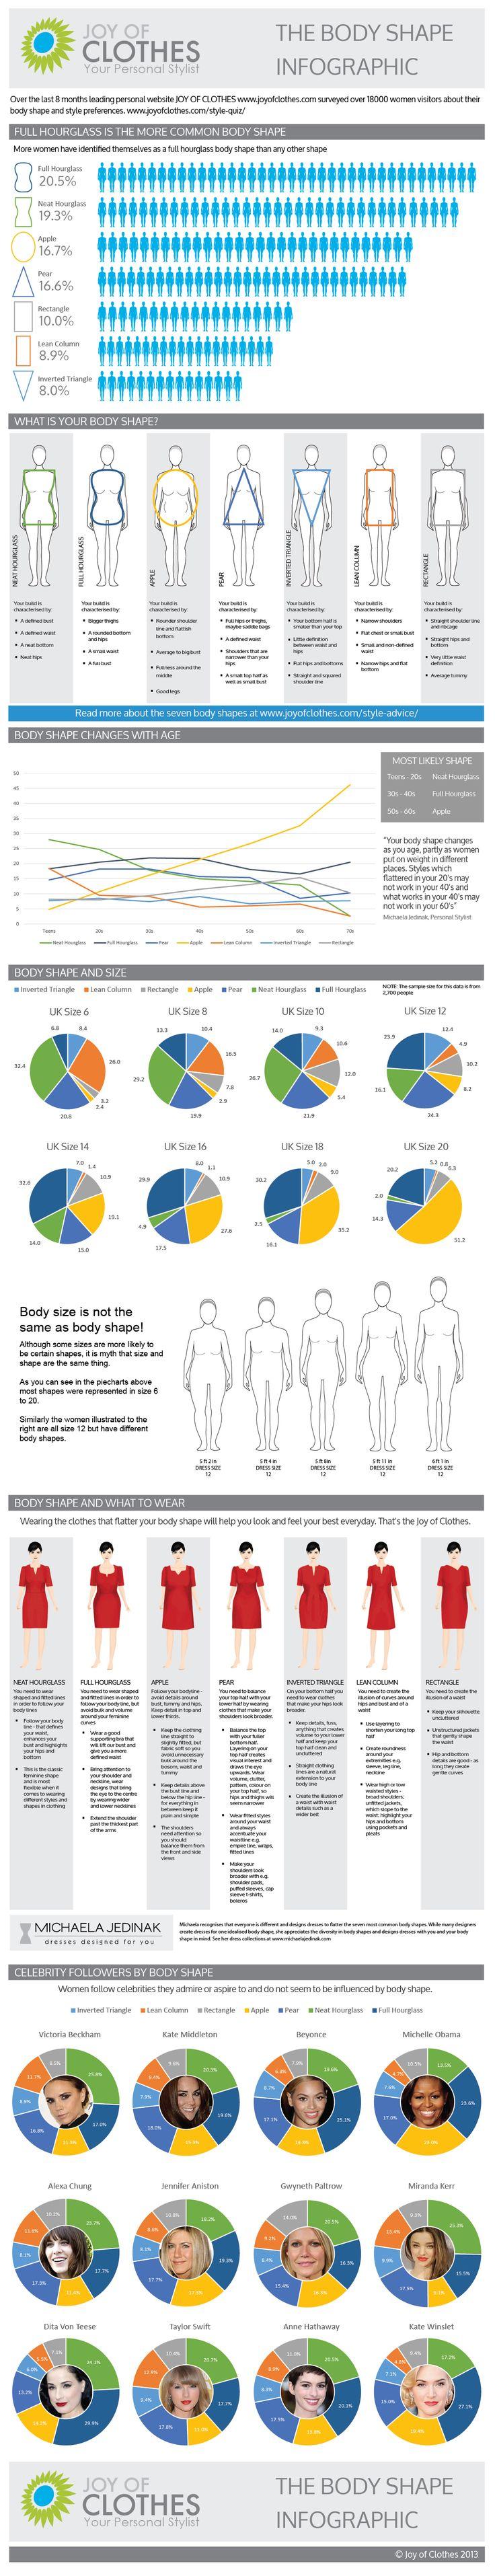 Body shape statistics